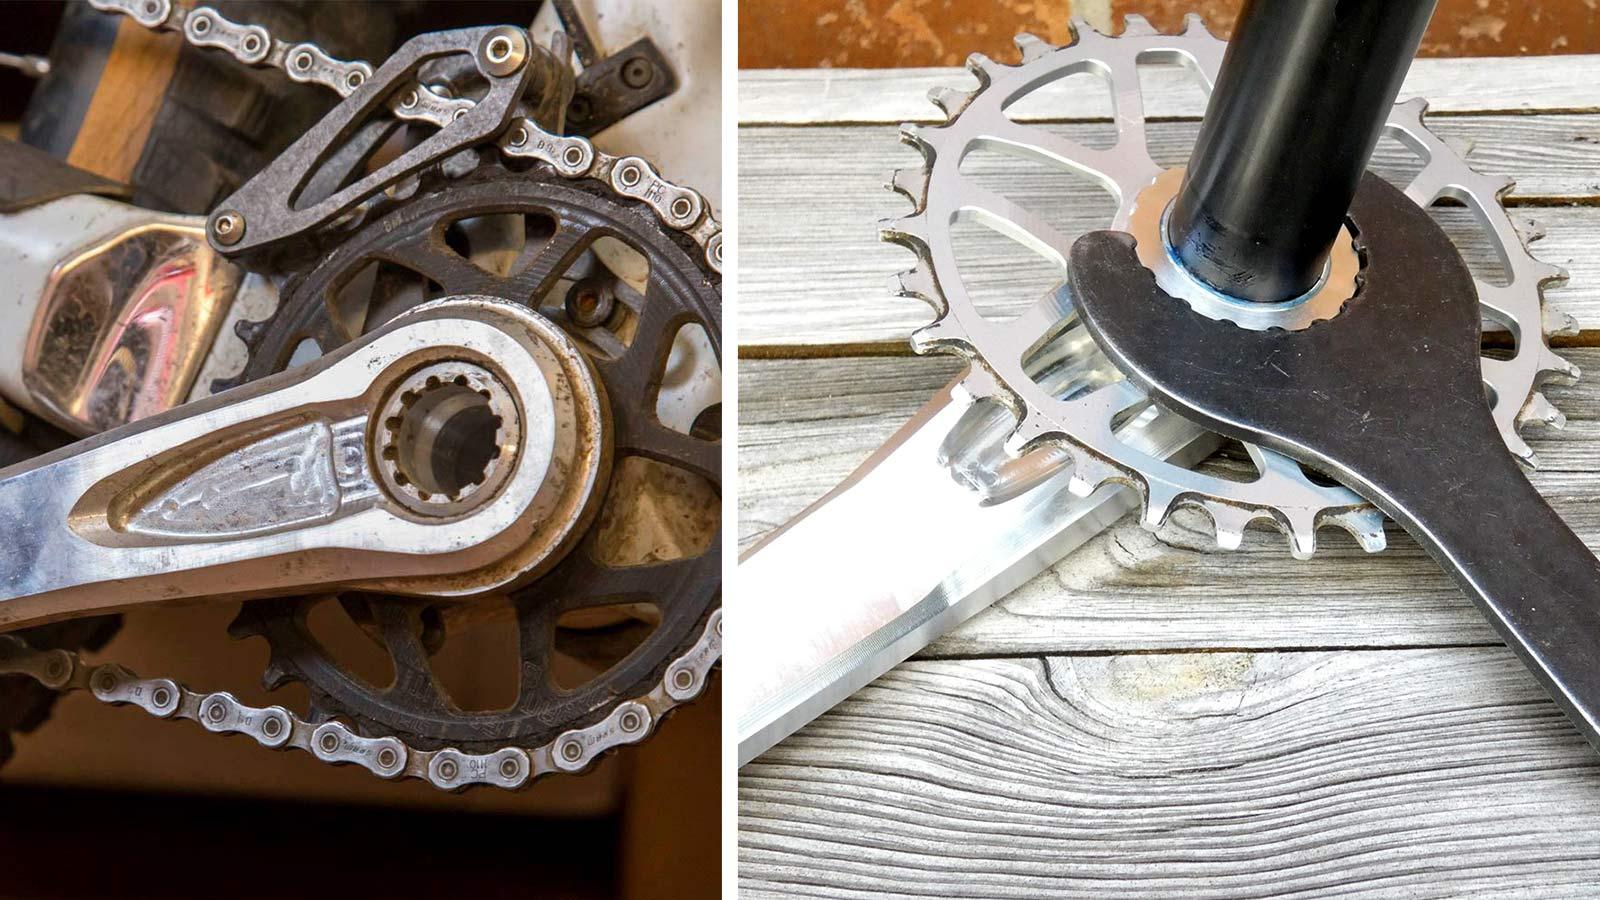 Intend Rocksteady cranks, made-in-Germany machined aluminum enduro all-mountain bike crankset,tech details